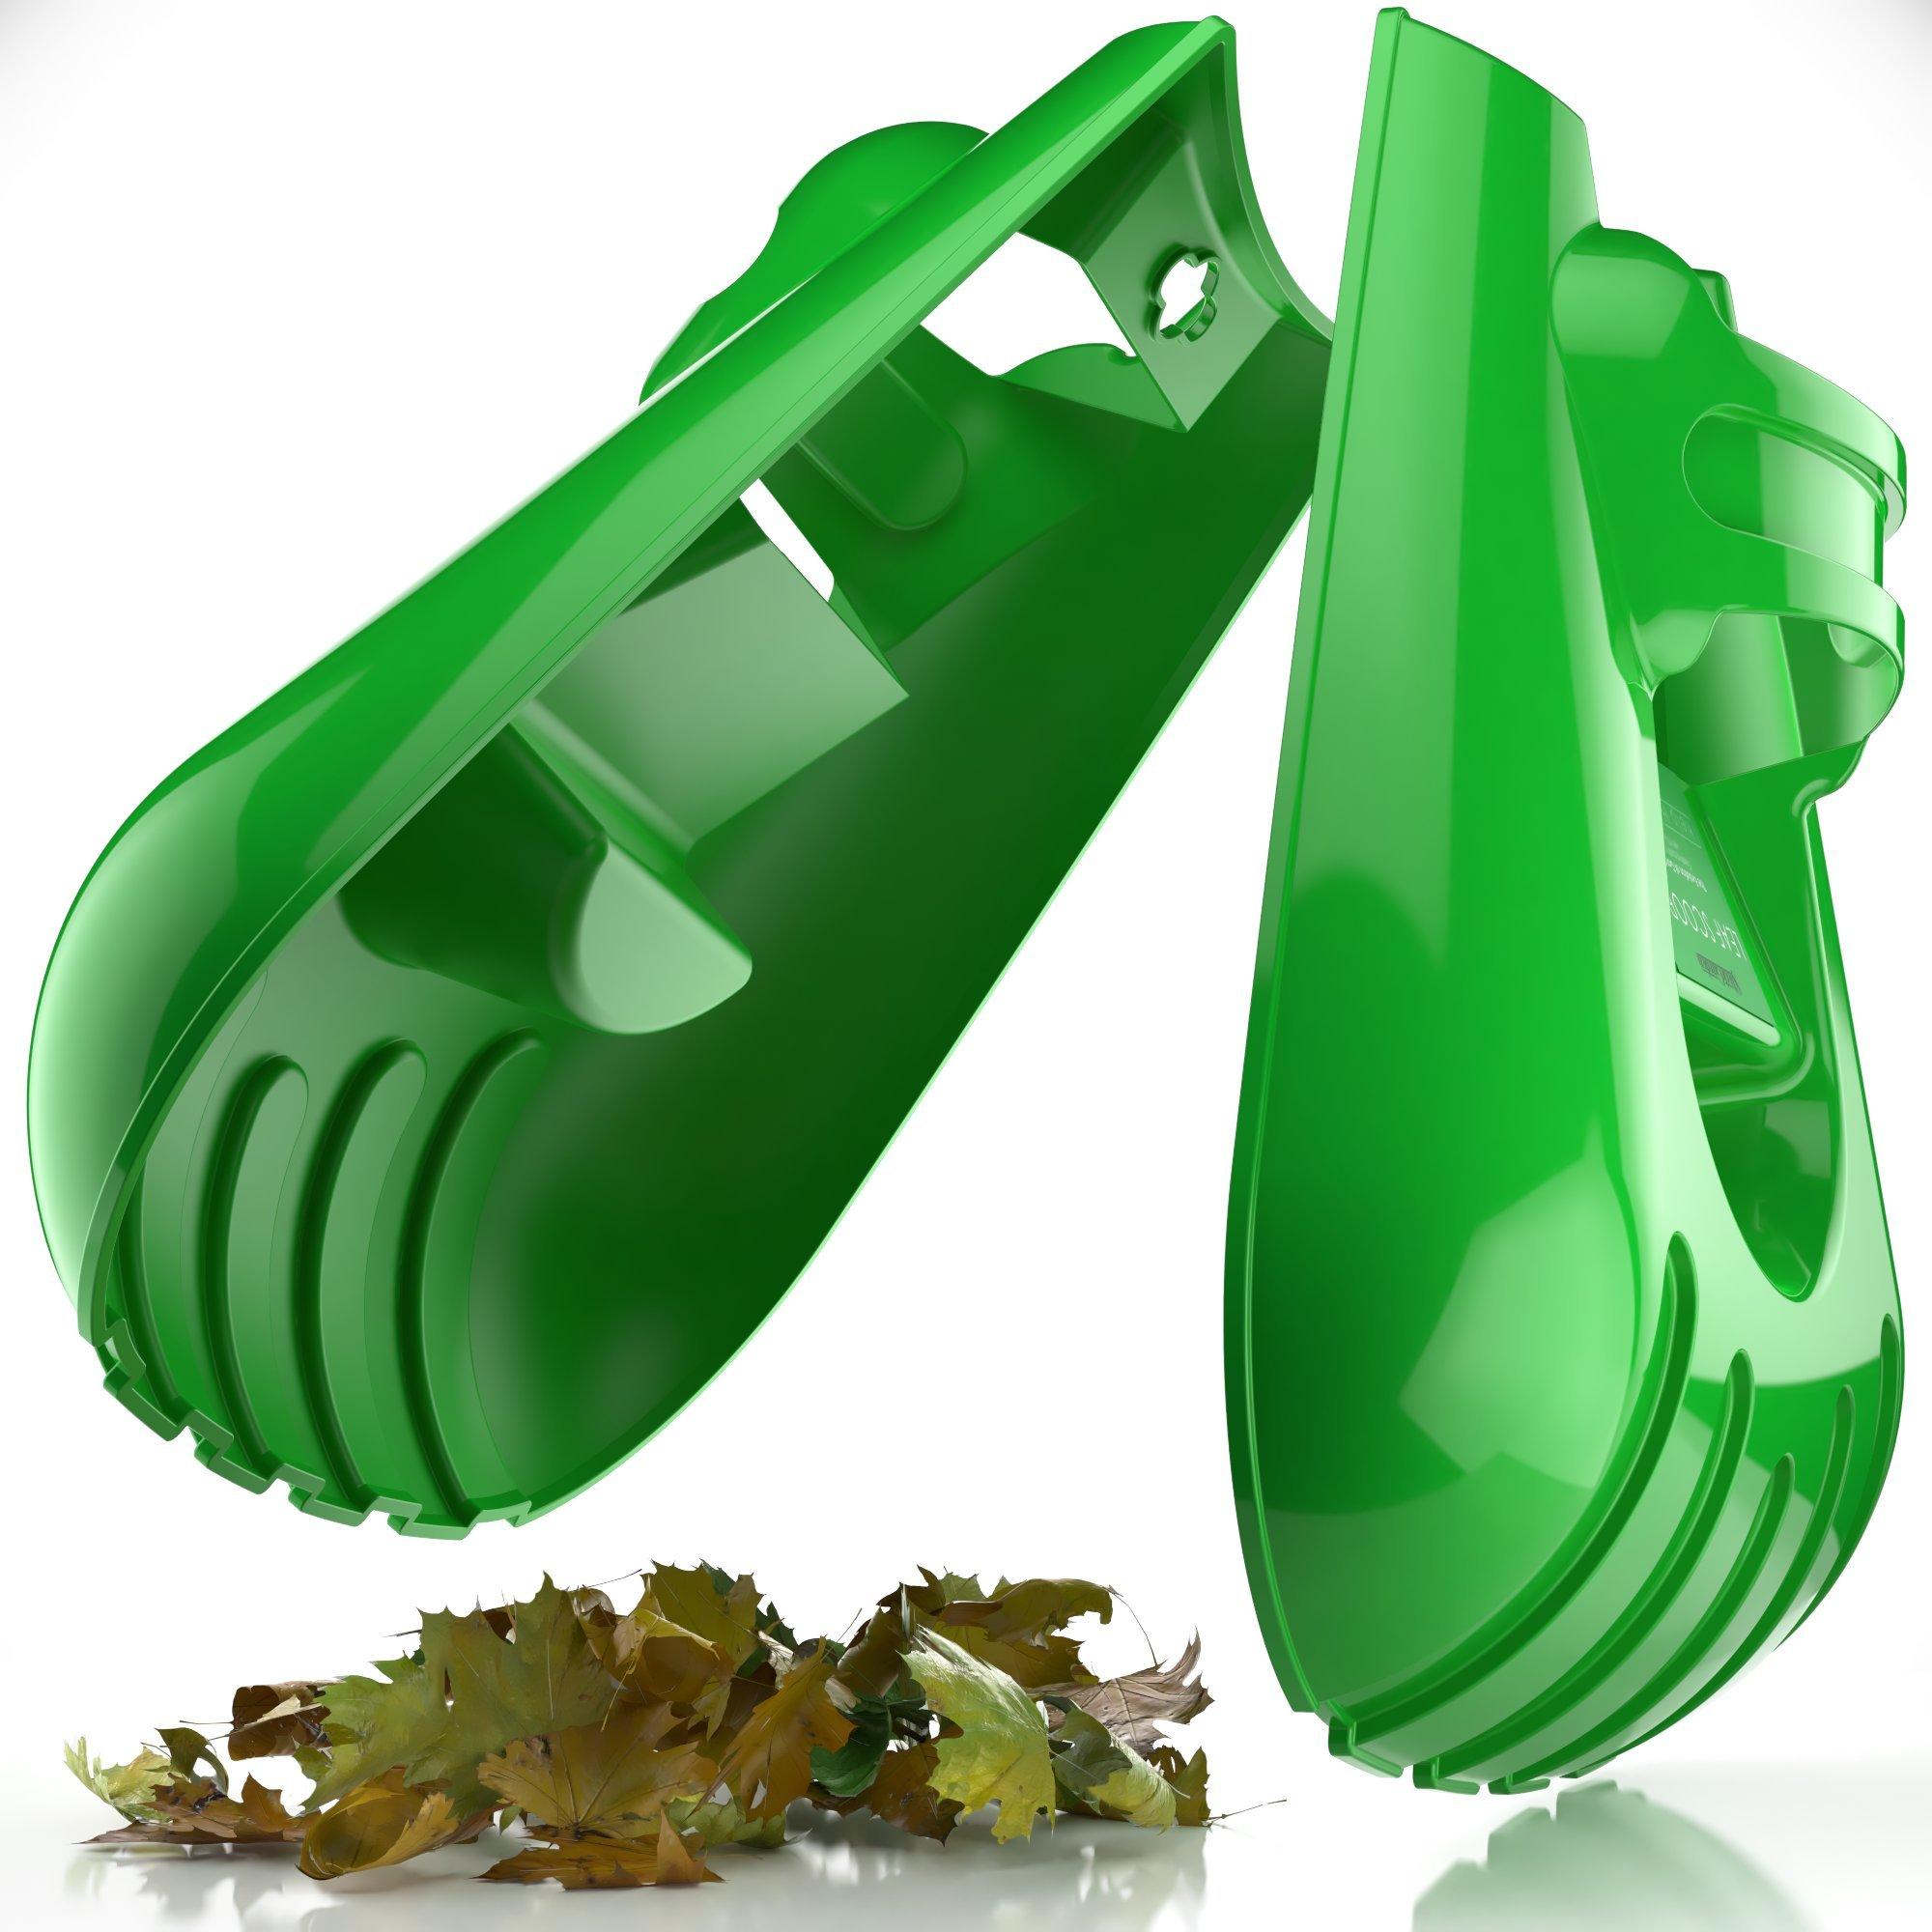 Sleek Garden Series Ergonomic Large Leaf Scoop Hand Rakes –Fast Leaf, Debris and Yard Waste Removal